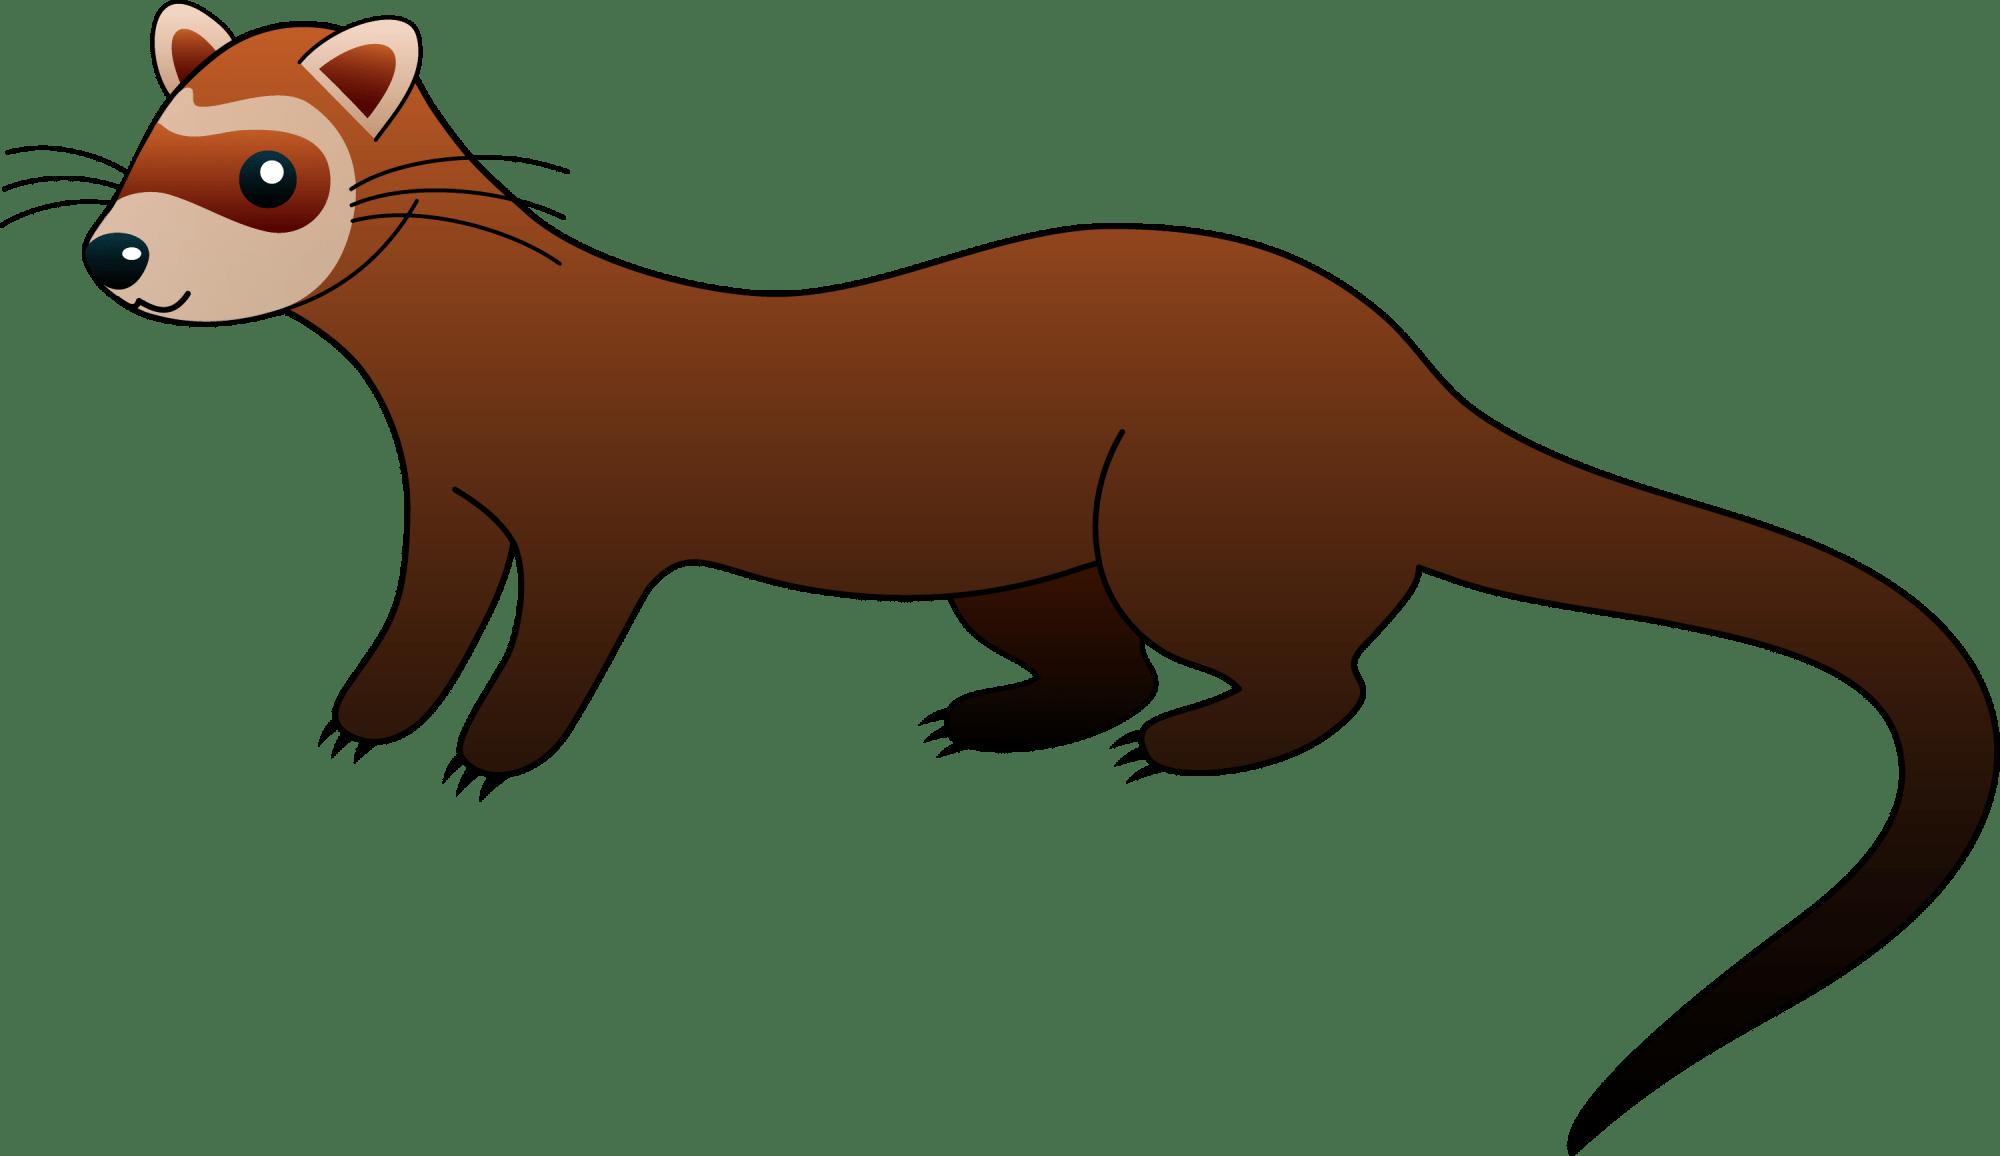 hight resolution of cute brown ferret clip art